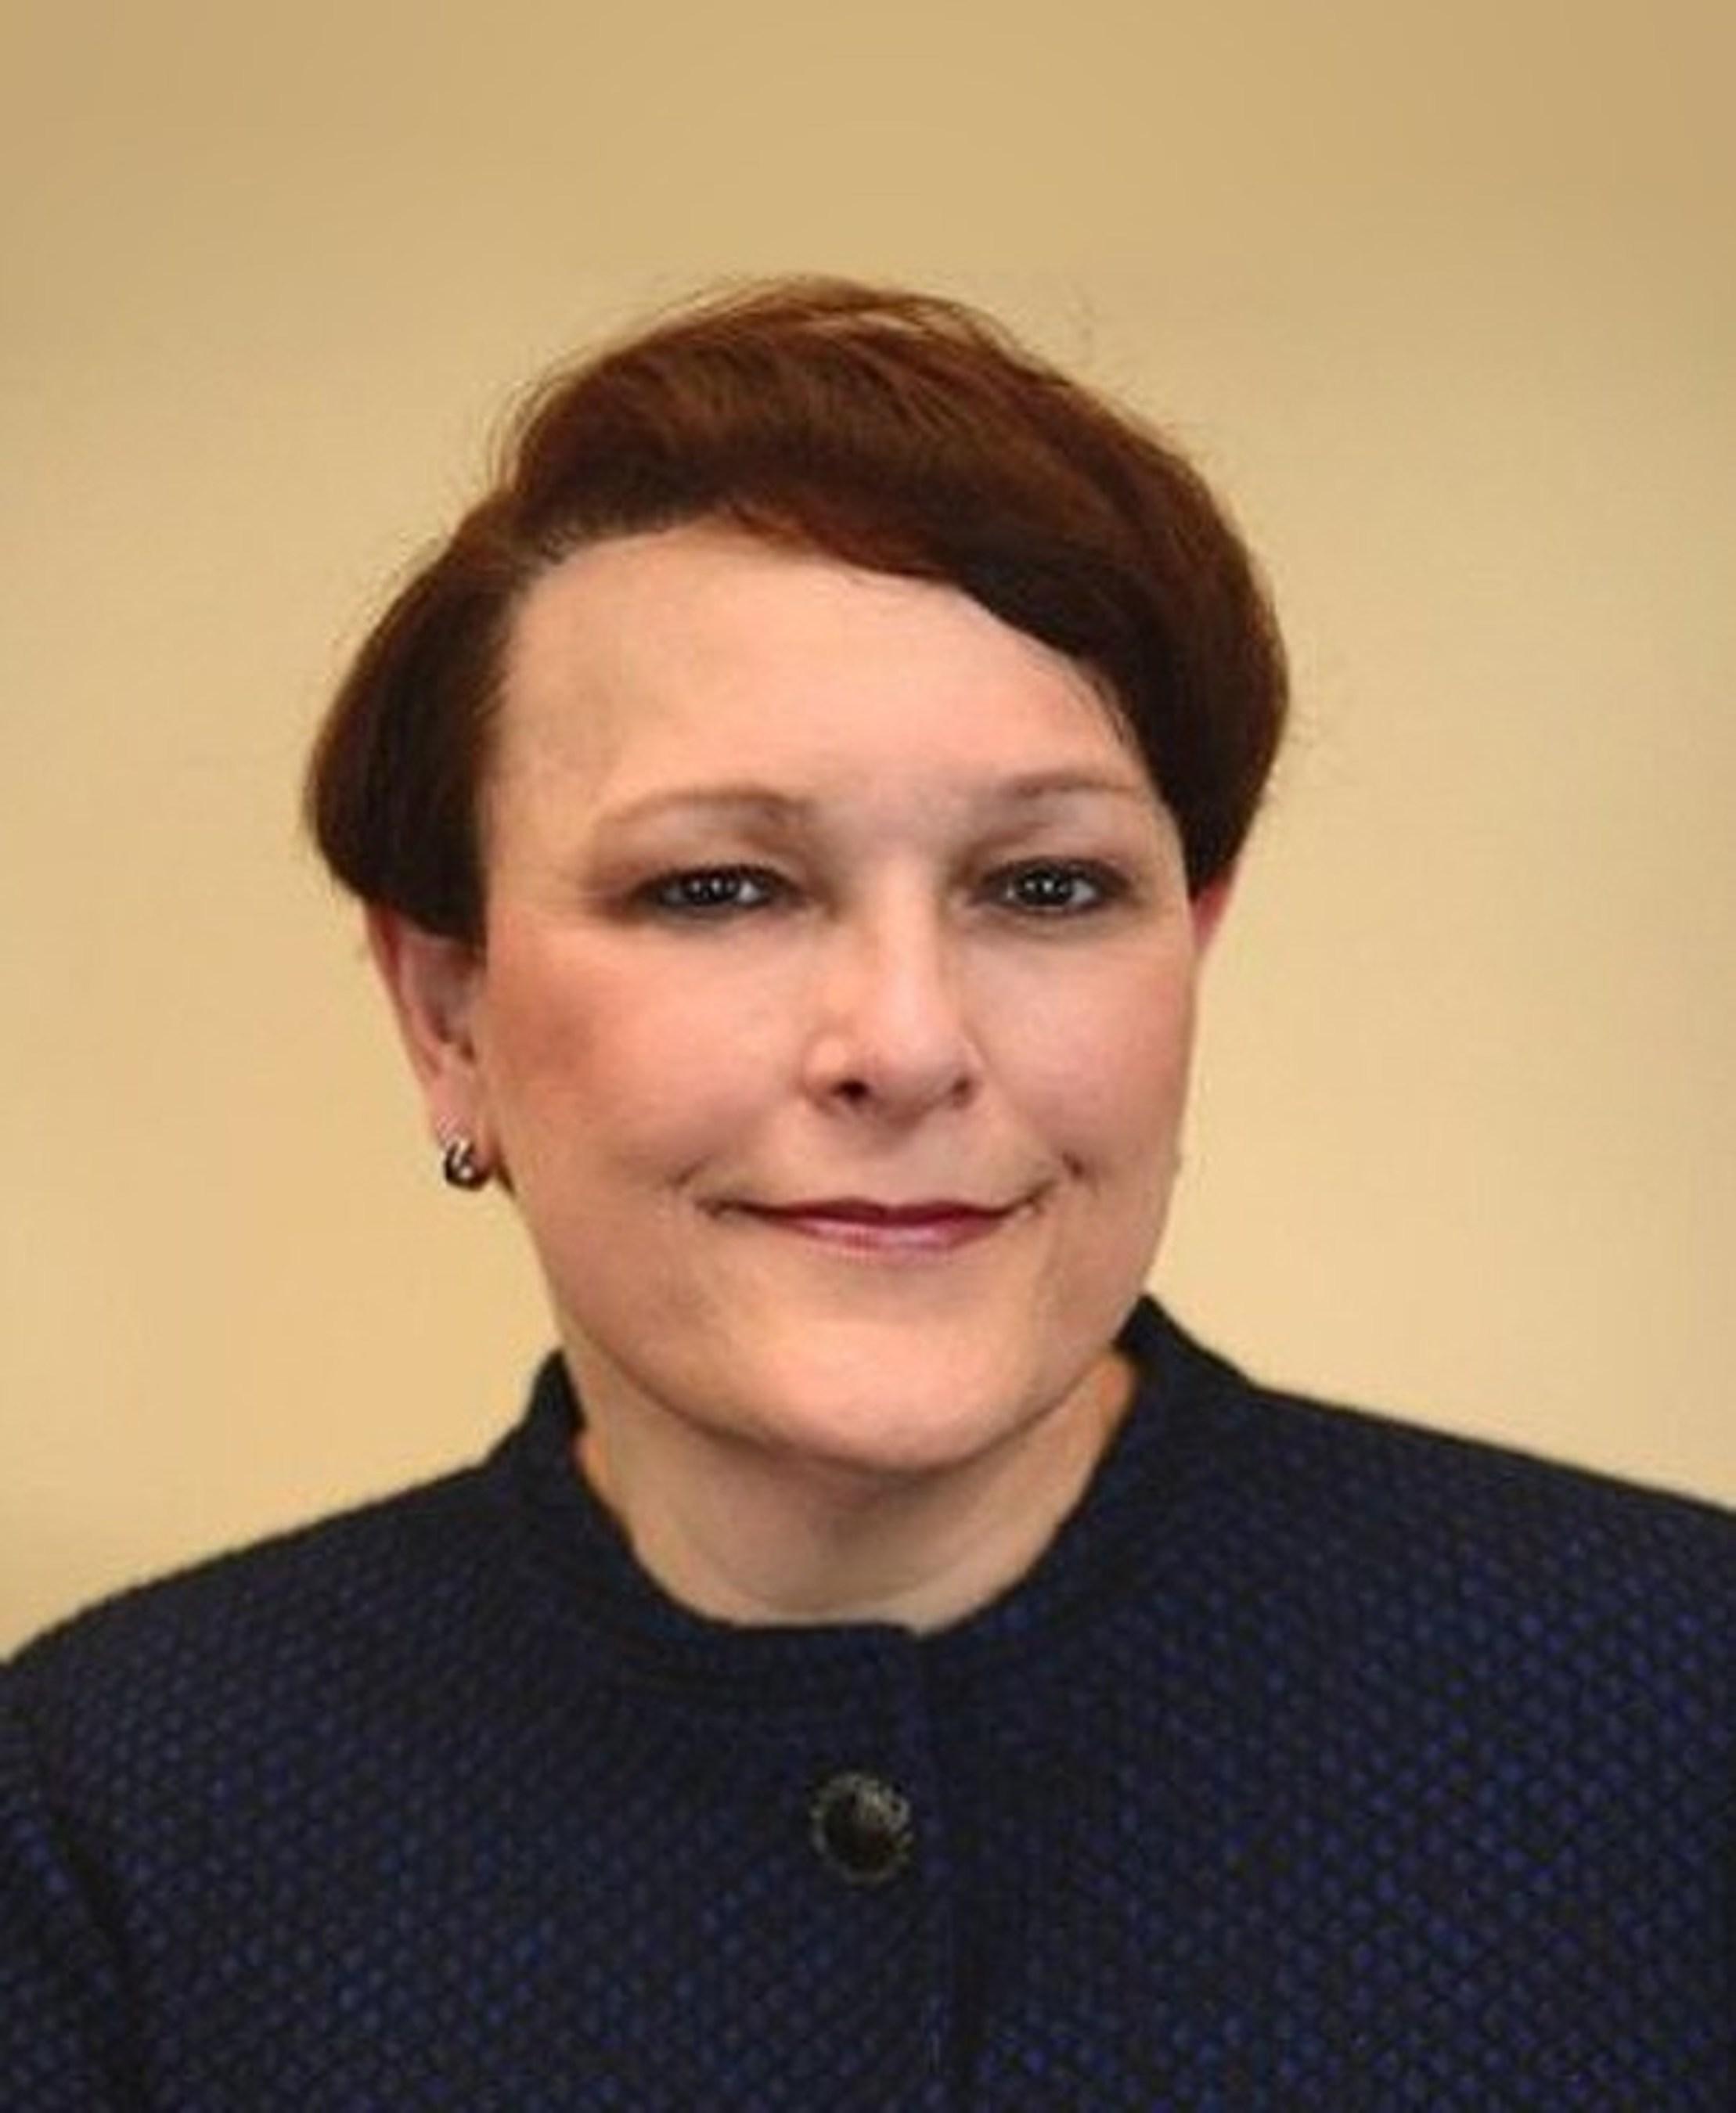 Nancy Daniels, Nautilus Hyosung America, EVP and COO